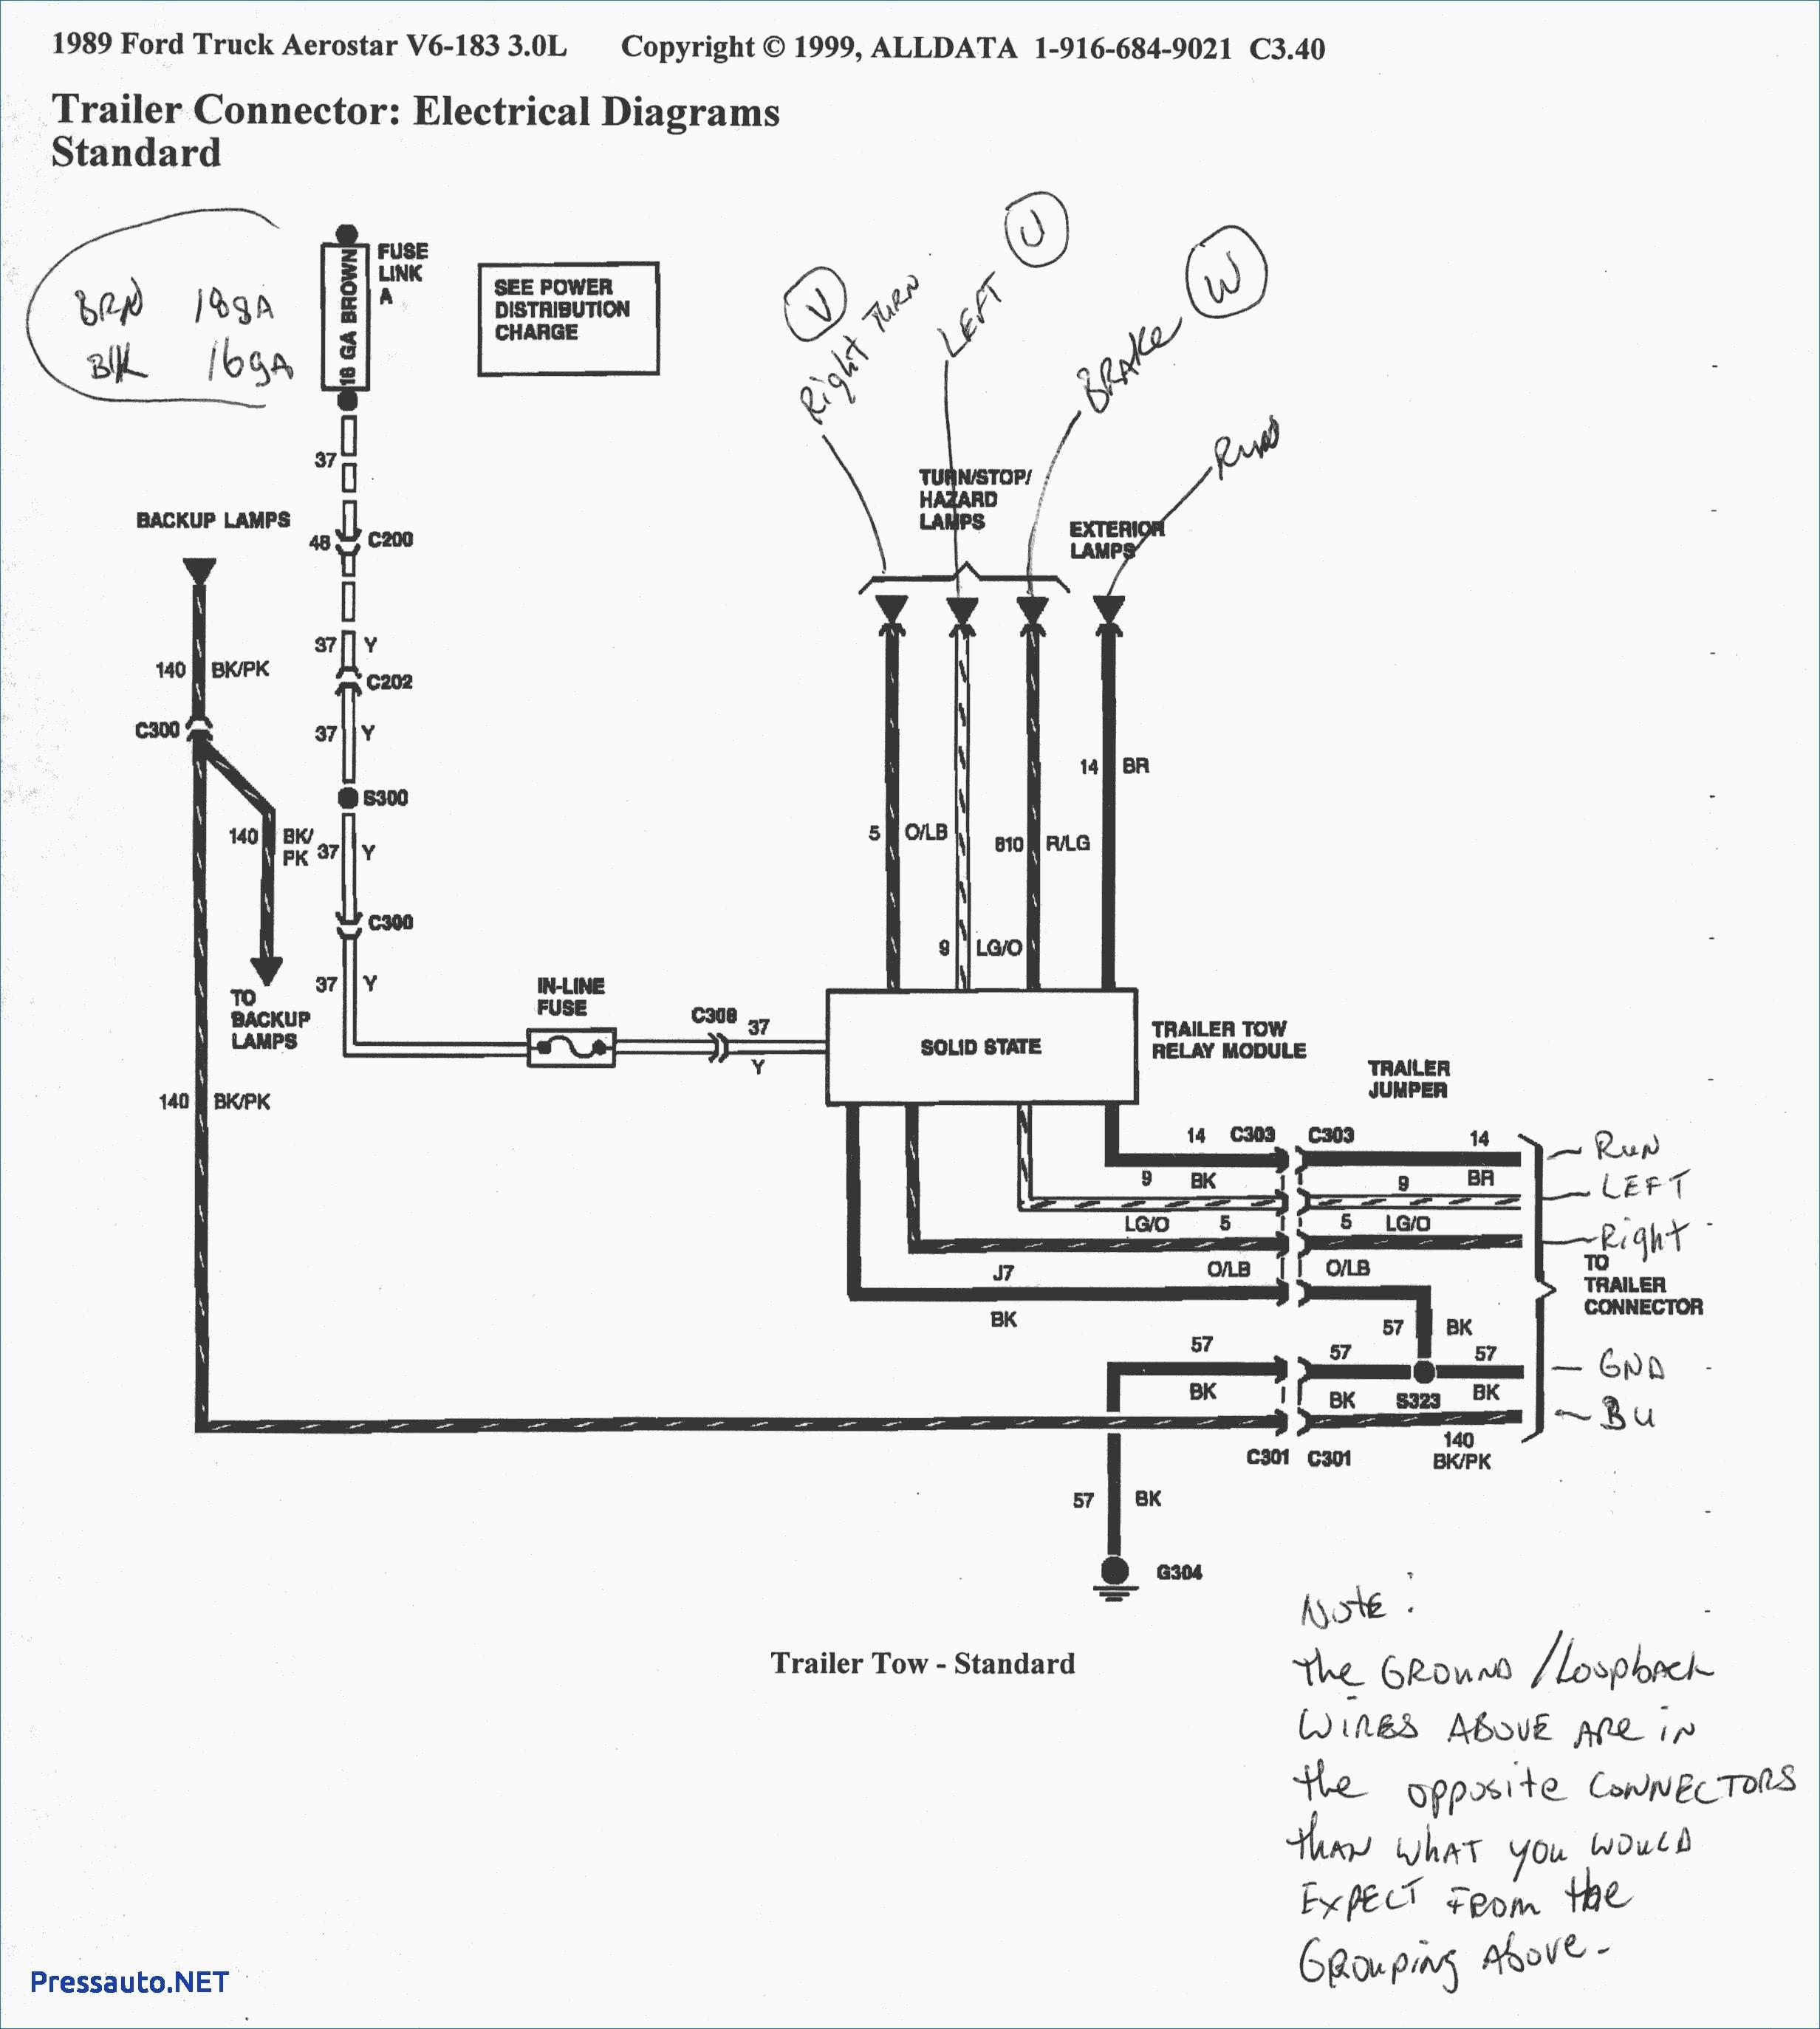 Enjoyable 2002 Ford F150 Trailer Wiring Diagram Download Wiring Diagram Sample Wiring Cloud Histehirlexornumapkesianilluminateatxorg